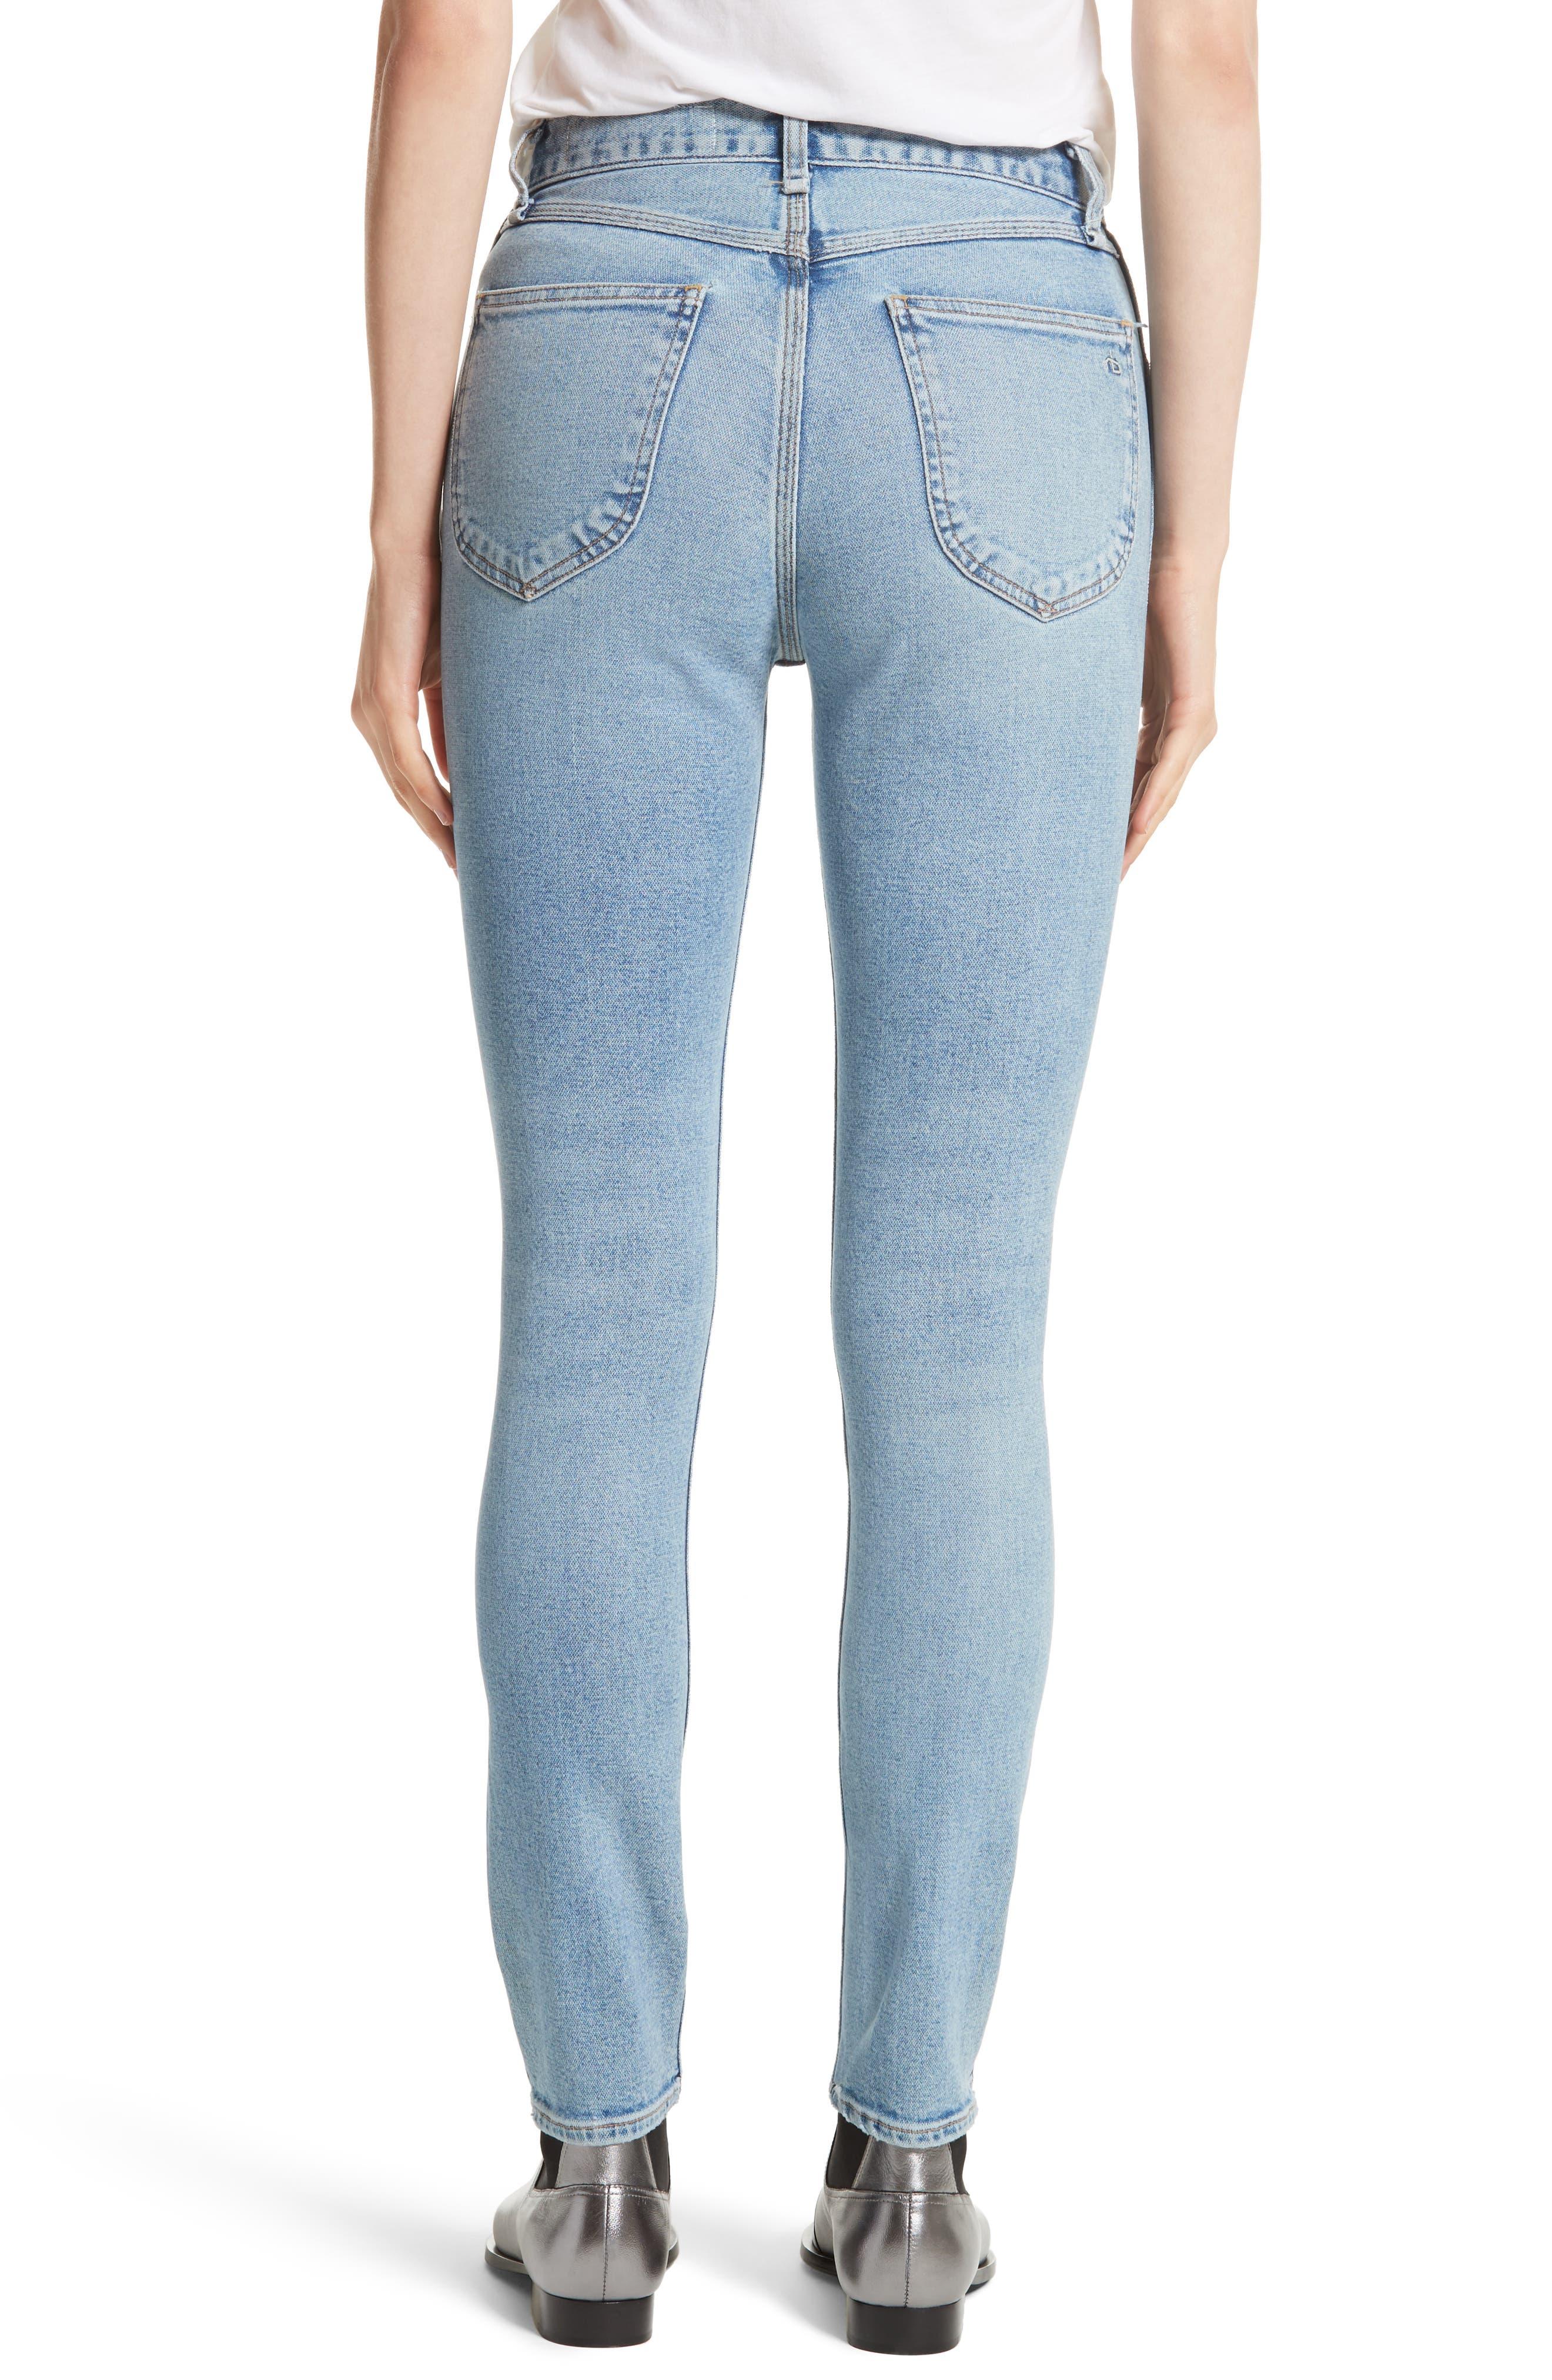 Alternate Image 3  - rag & bone/JEAN Lou High Waist Skinny Jeans (Hotbird)